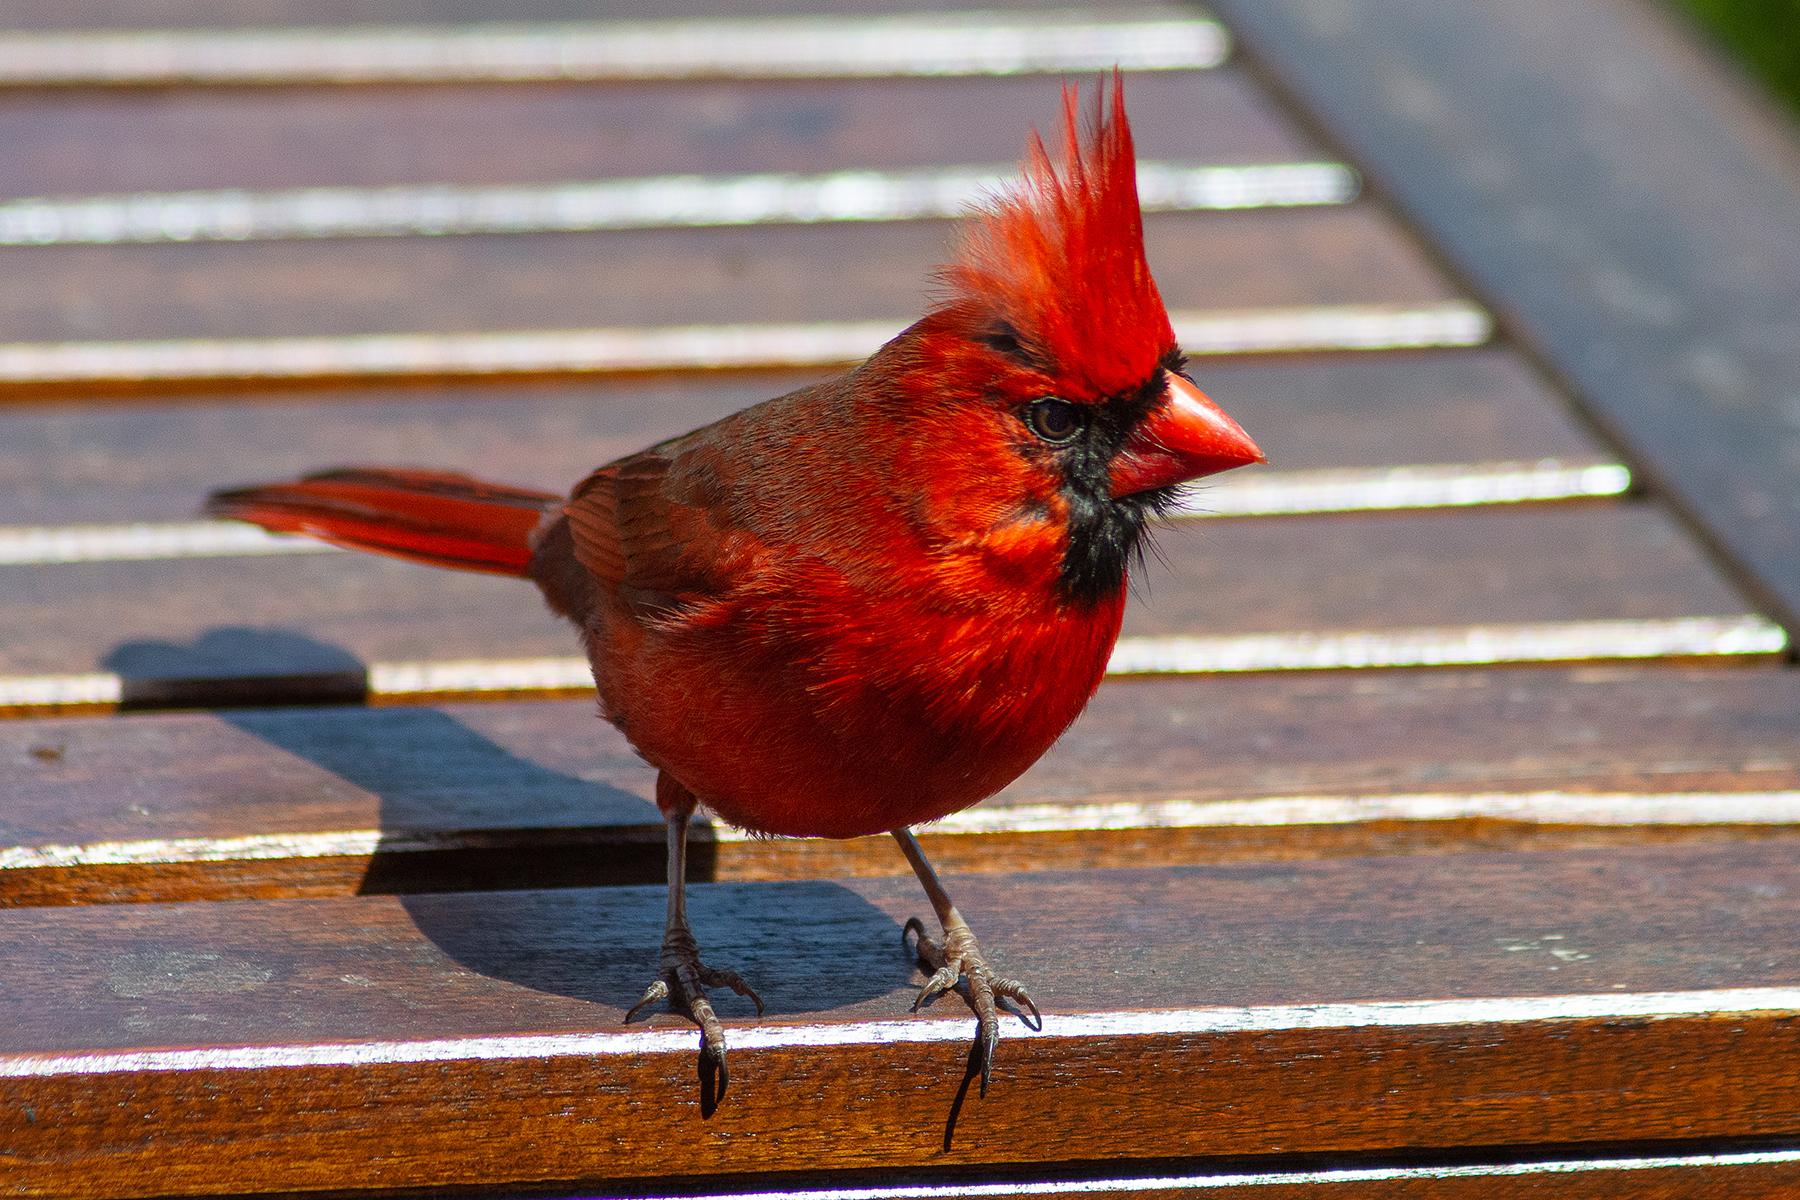 how long do cardinals live